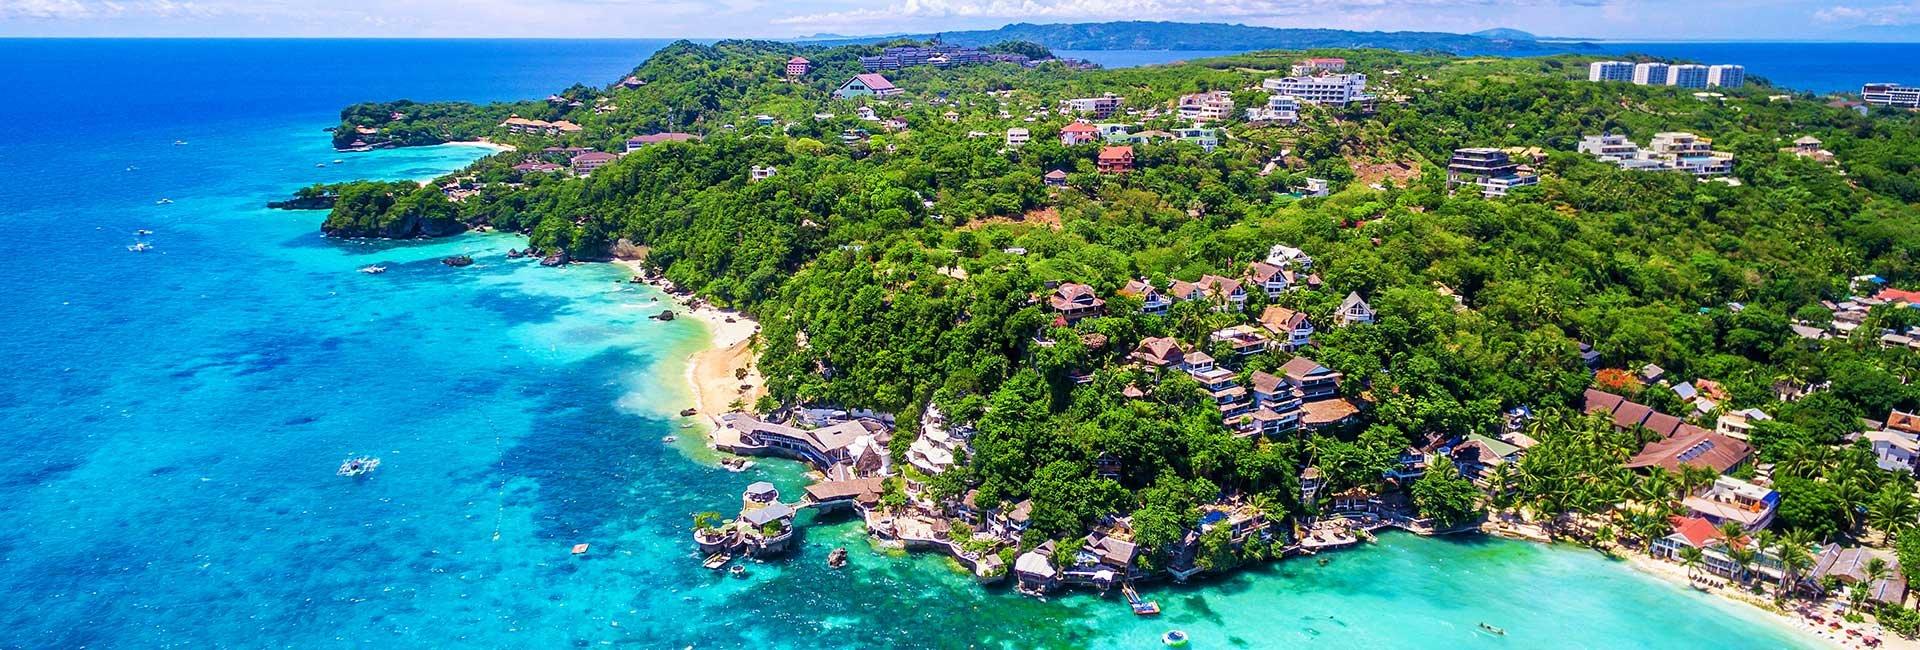 8_Visayas_Philippines